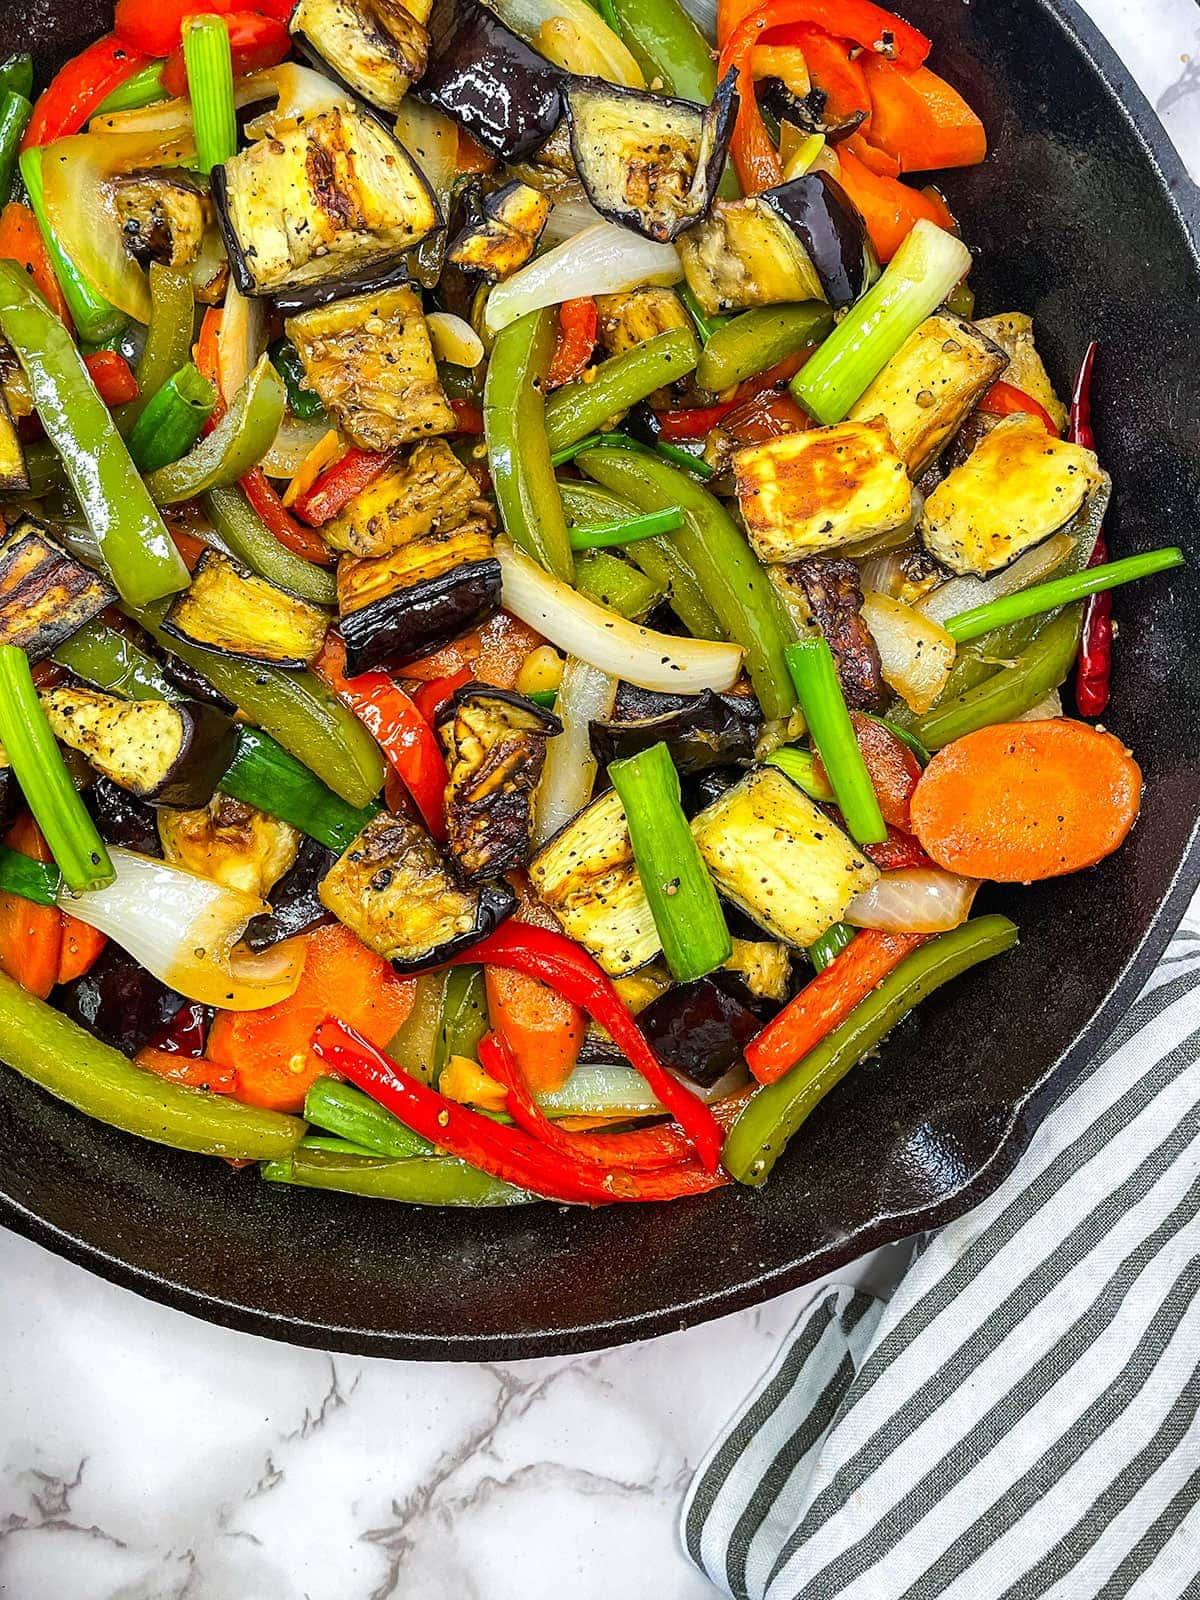 eggplant stir fry in a skillet